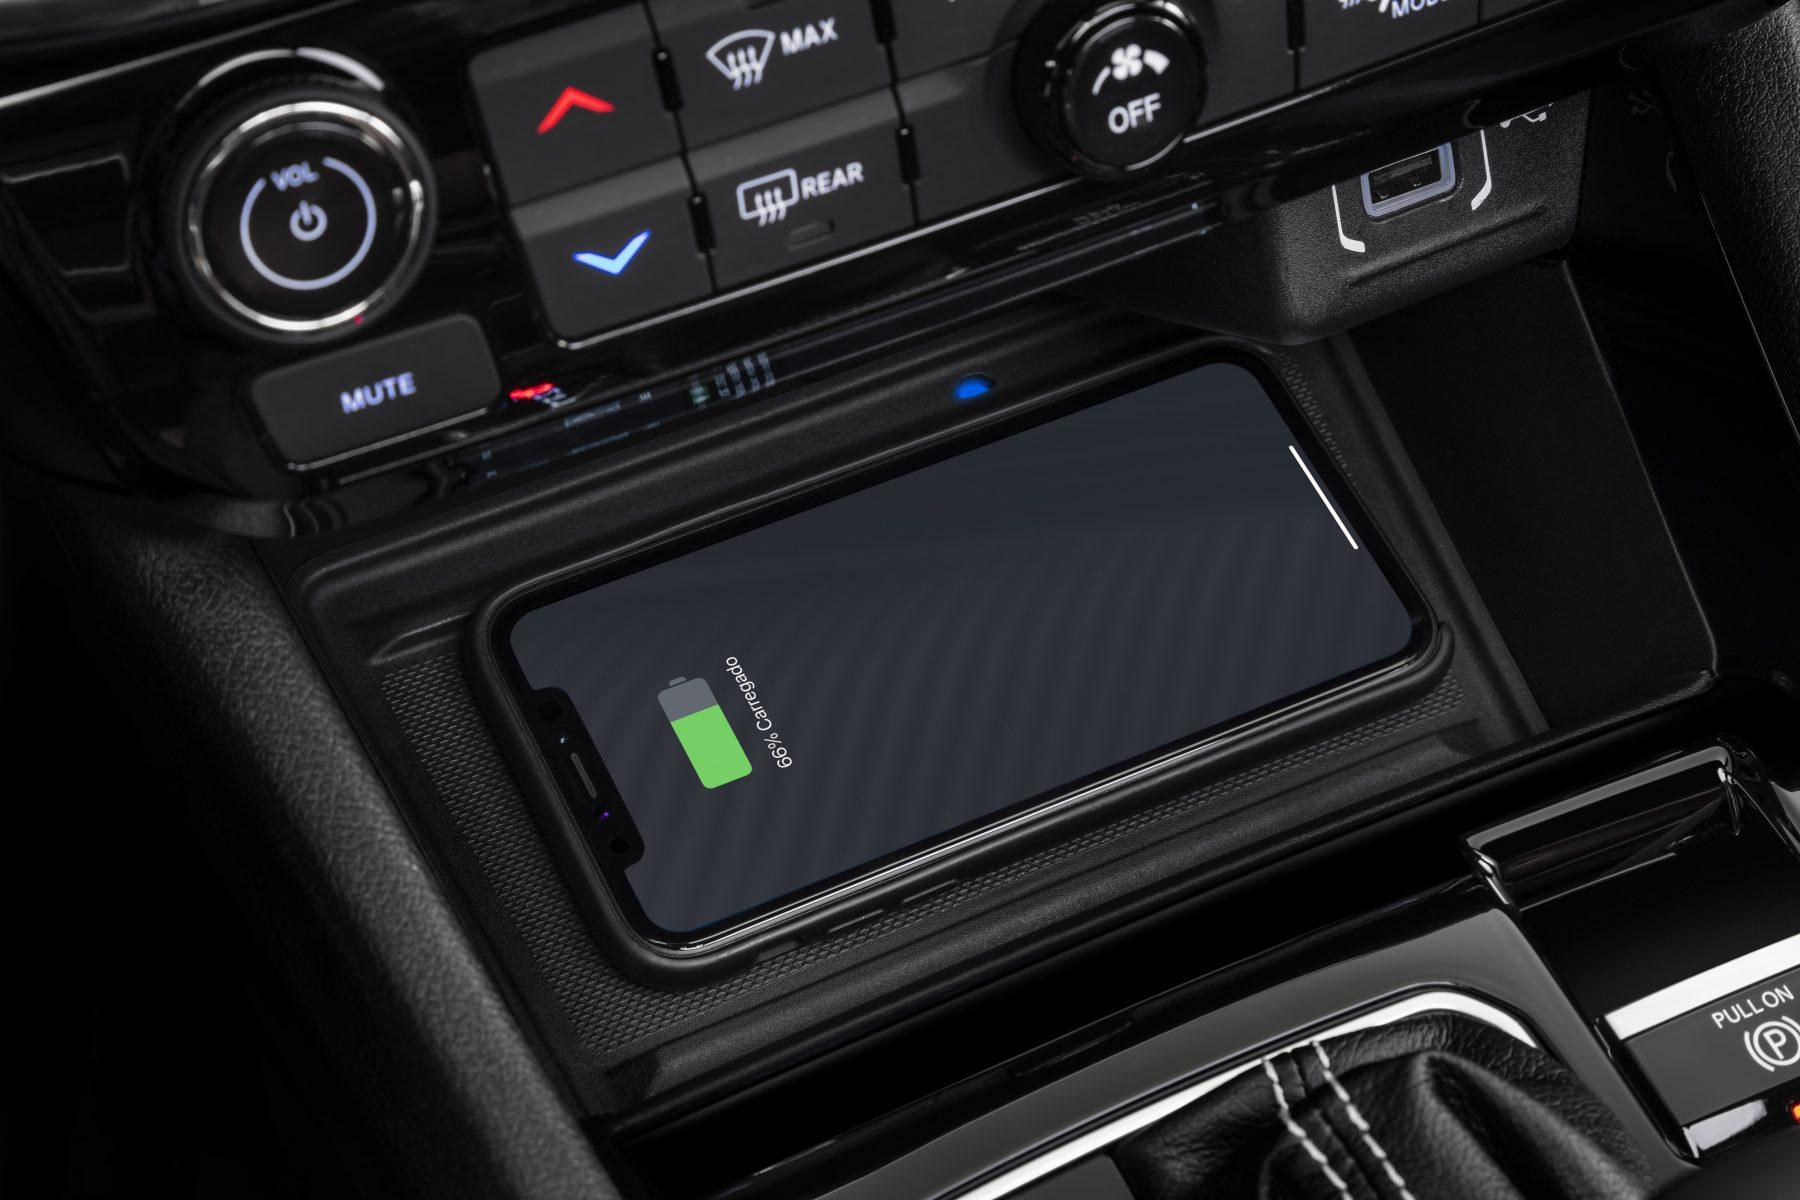 jeep compass s 2022 11